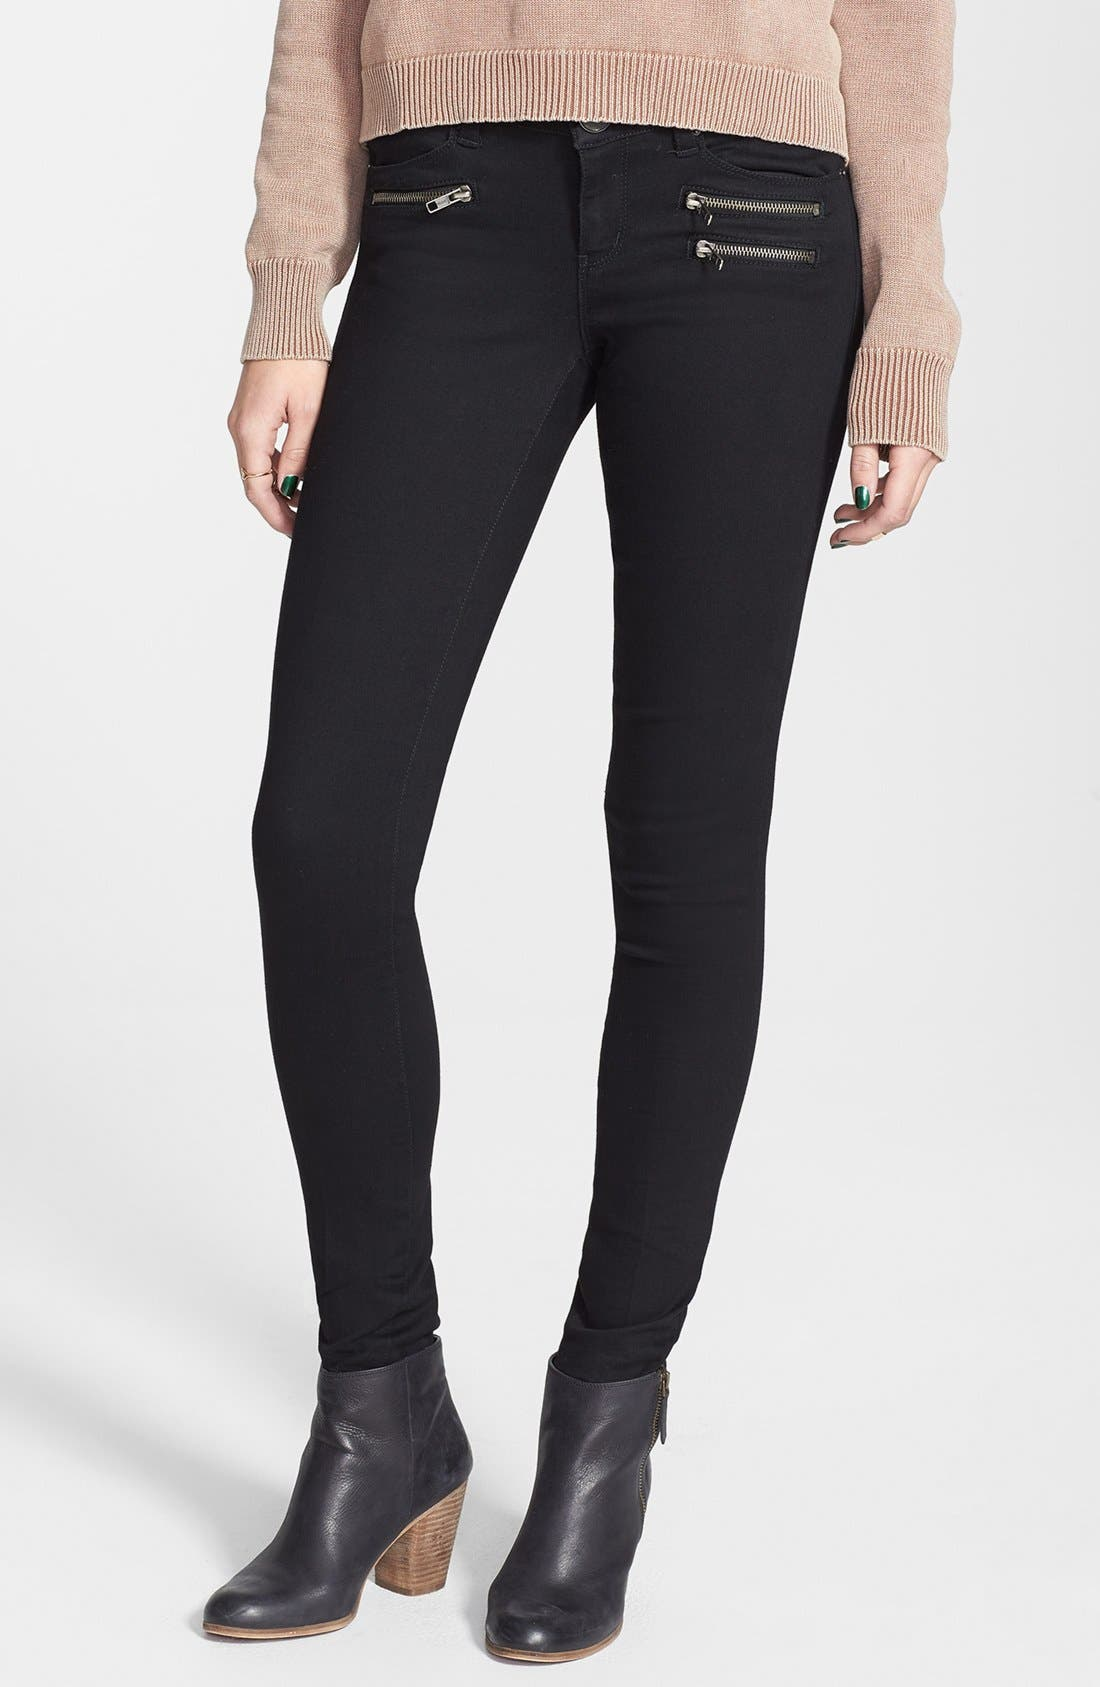 Main Image - Jolt Zipper Skinny Jeans (Juniors)